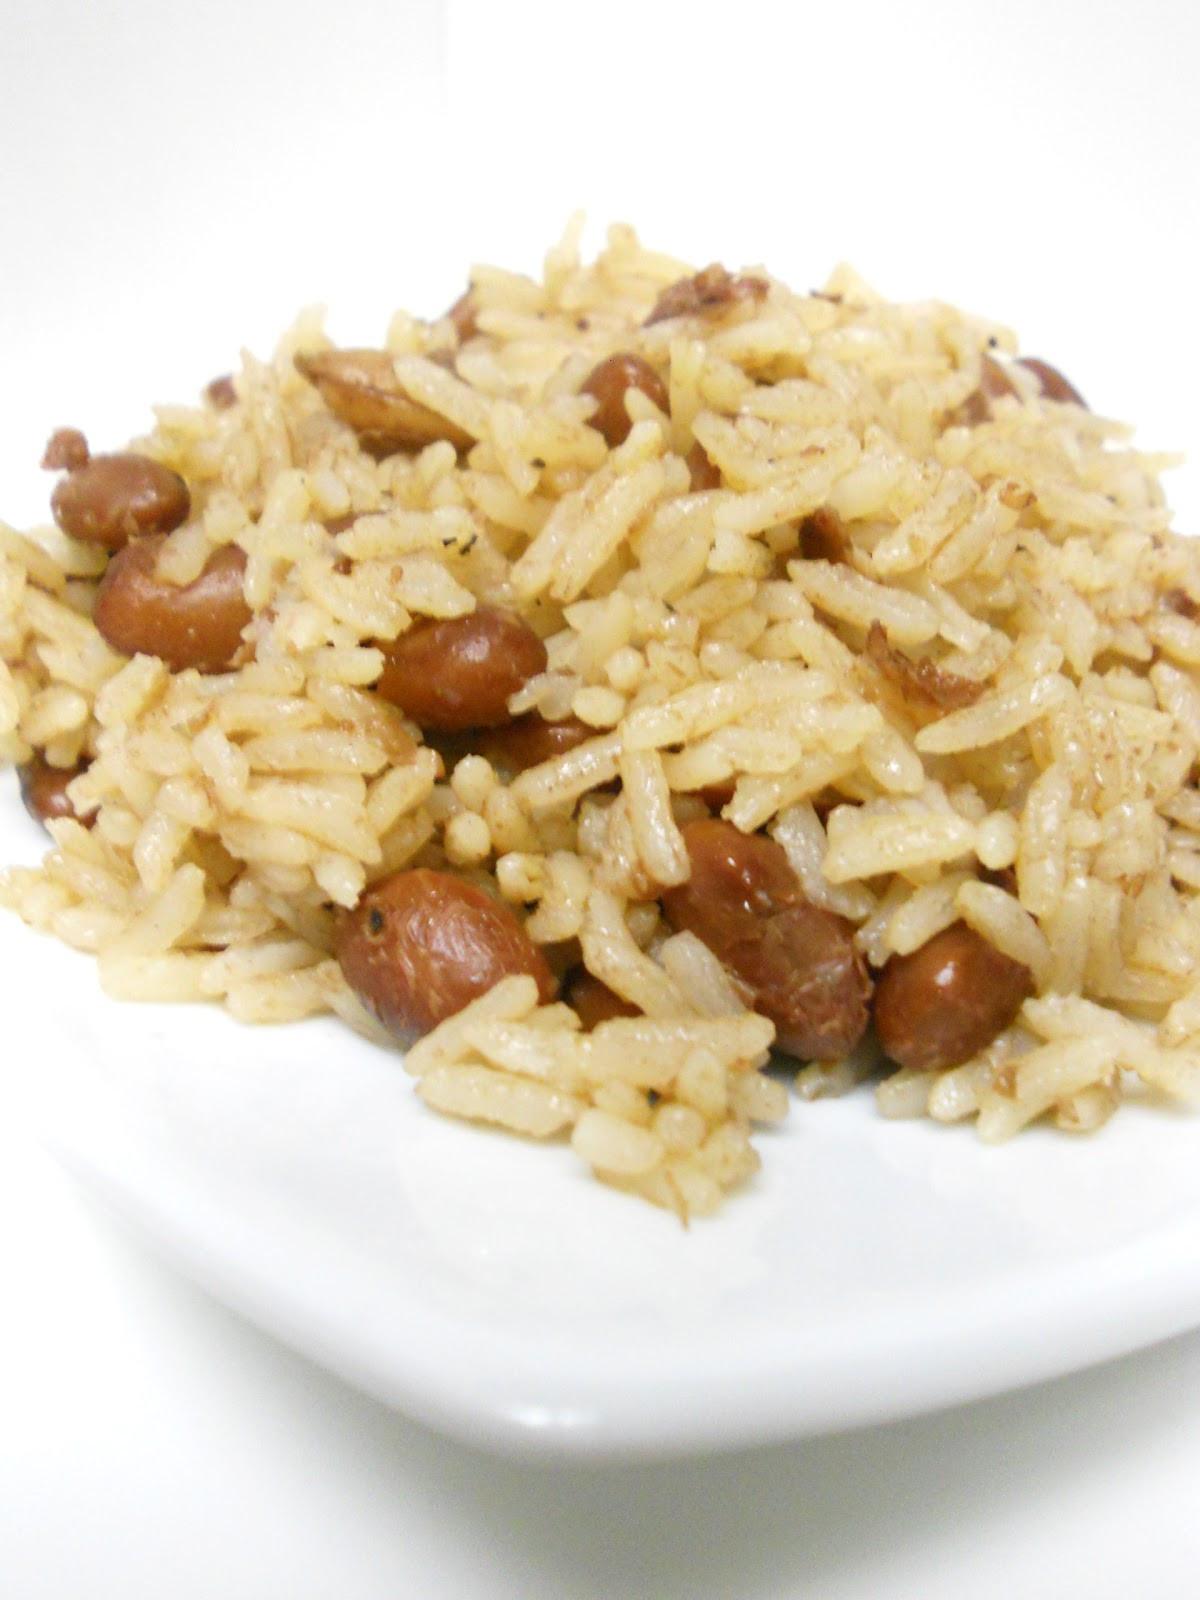 Haitian Rice And Beans  My Haitian Kitchen Red Beans & Rice Diri Kole ak pois rouge